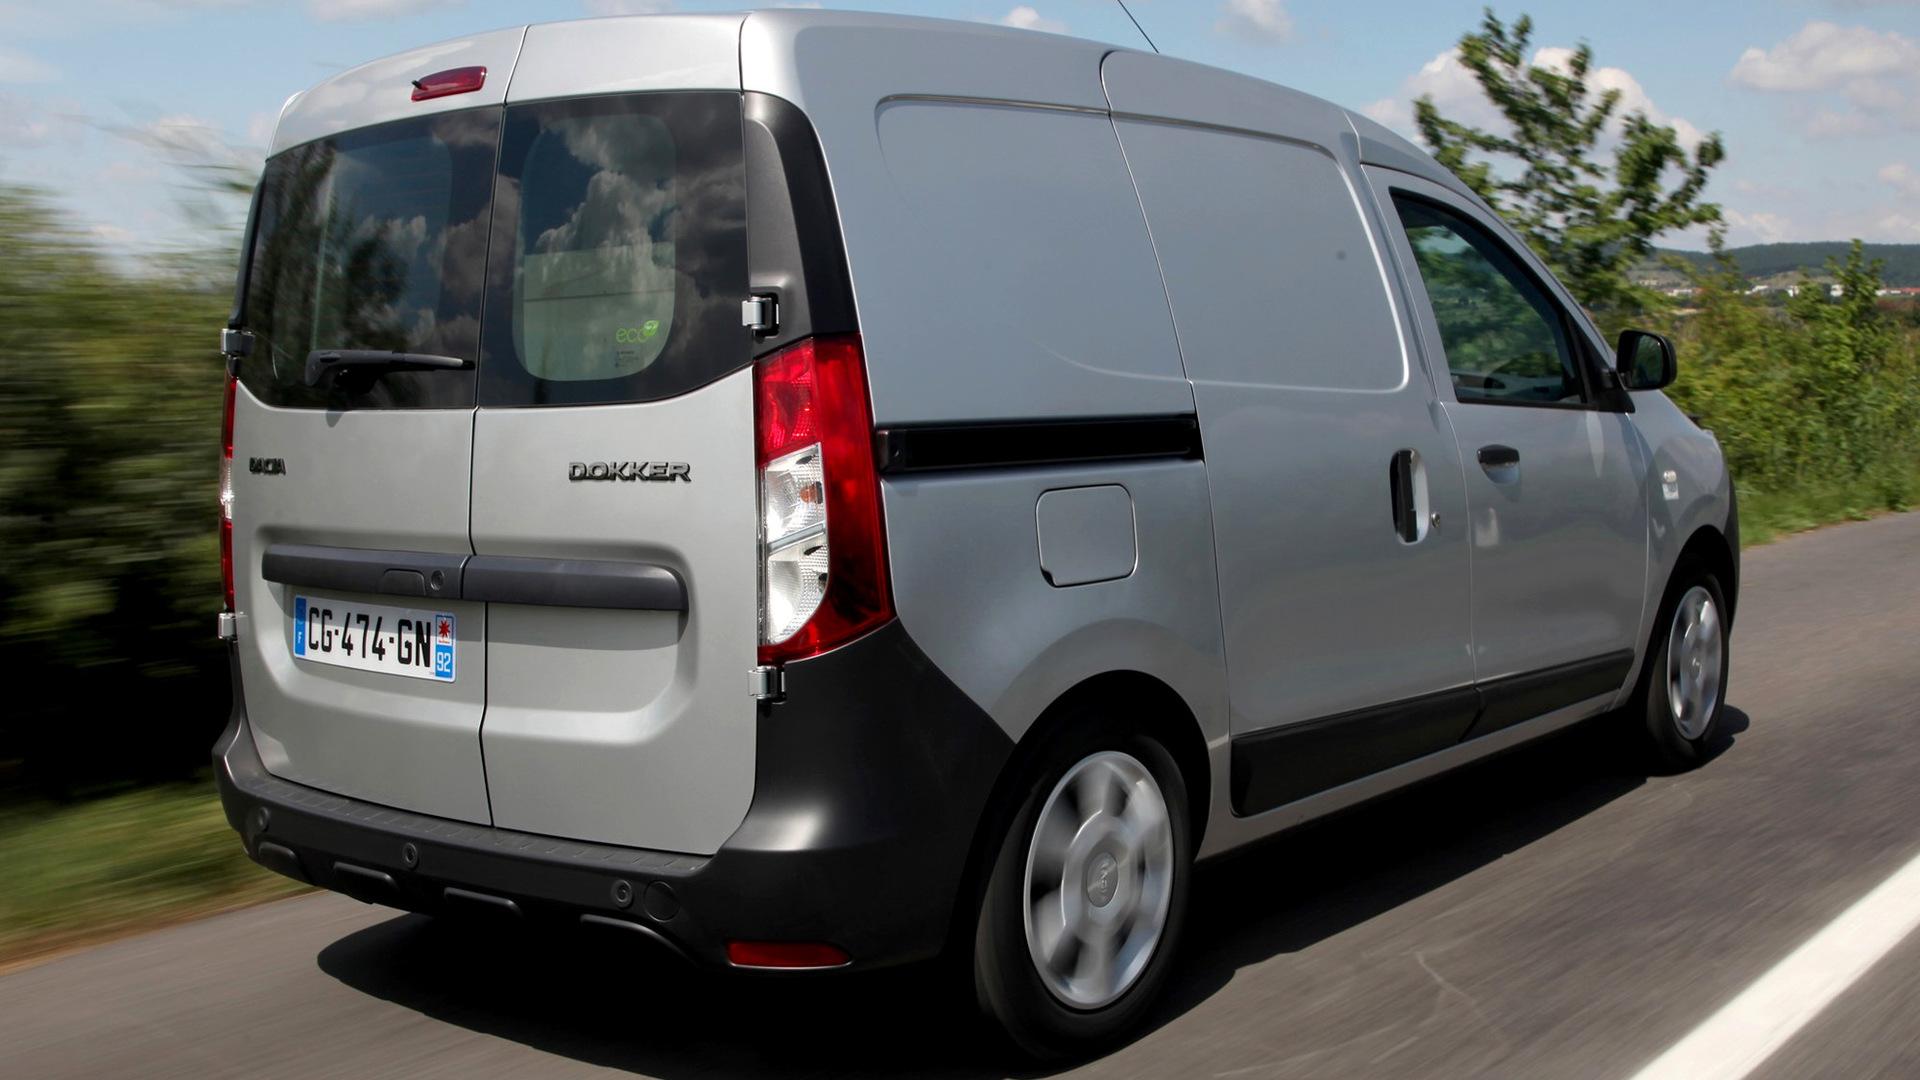 2012 Dacia Dokker Van - Wallpapers And HD Images